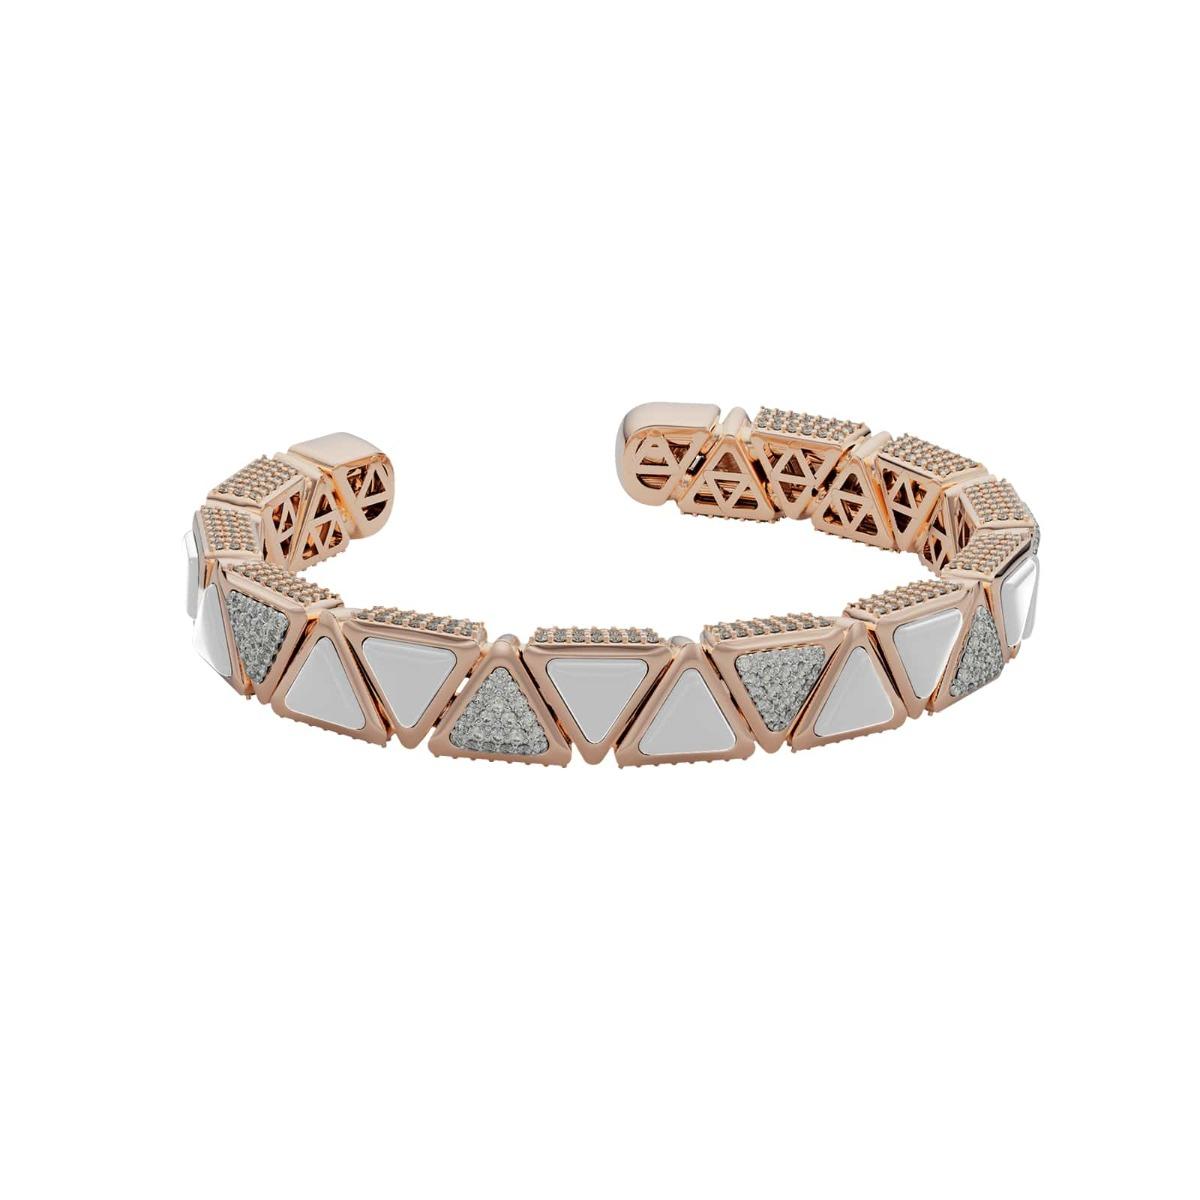 Bracelet BB Mirror Exquisite Rose Gold Kogolong and Diamonds